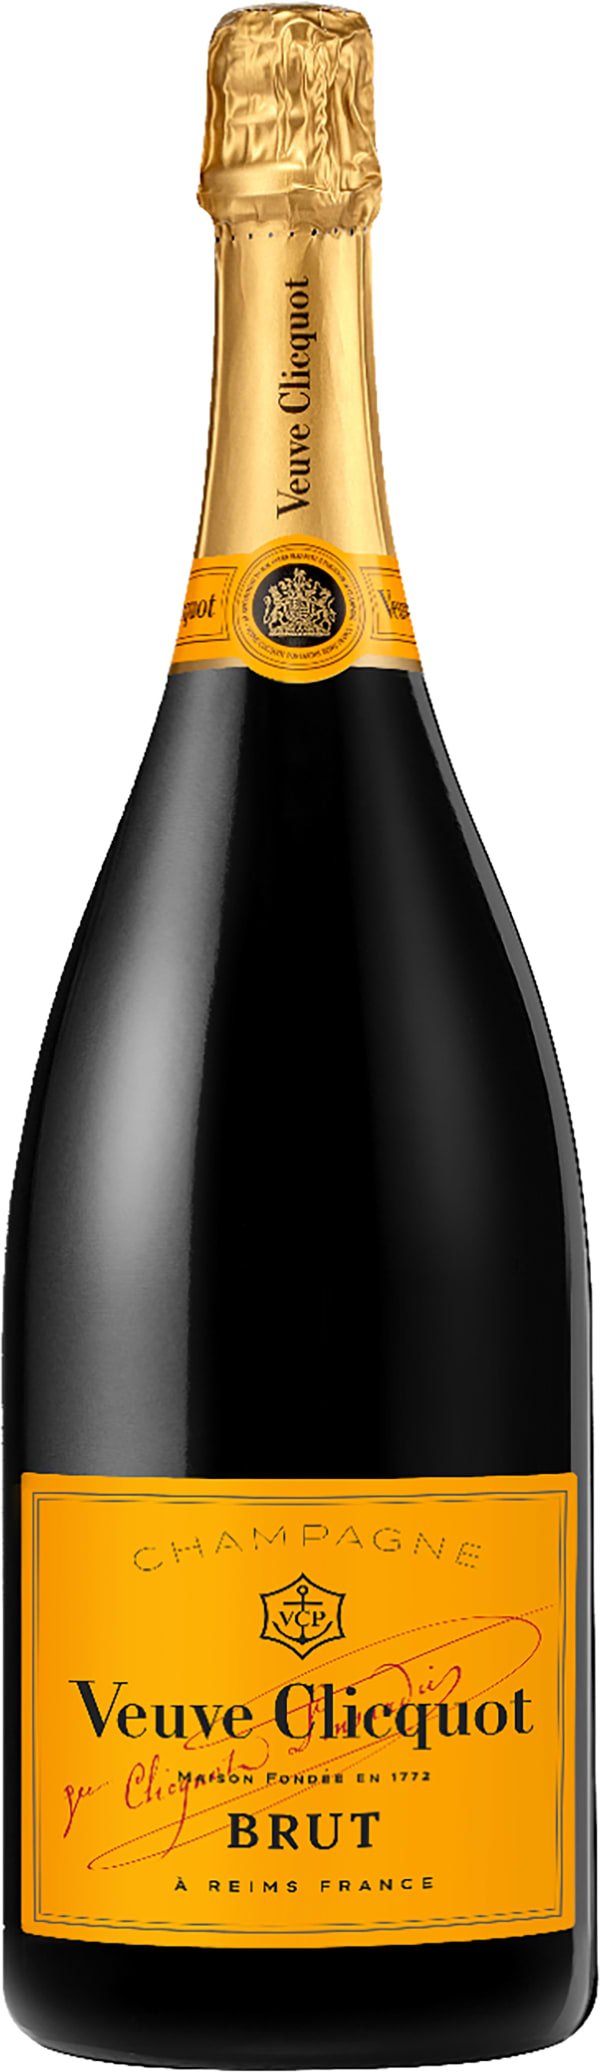 Veuve Clicquot Magnum Champagne Brut